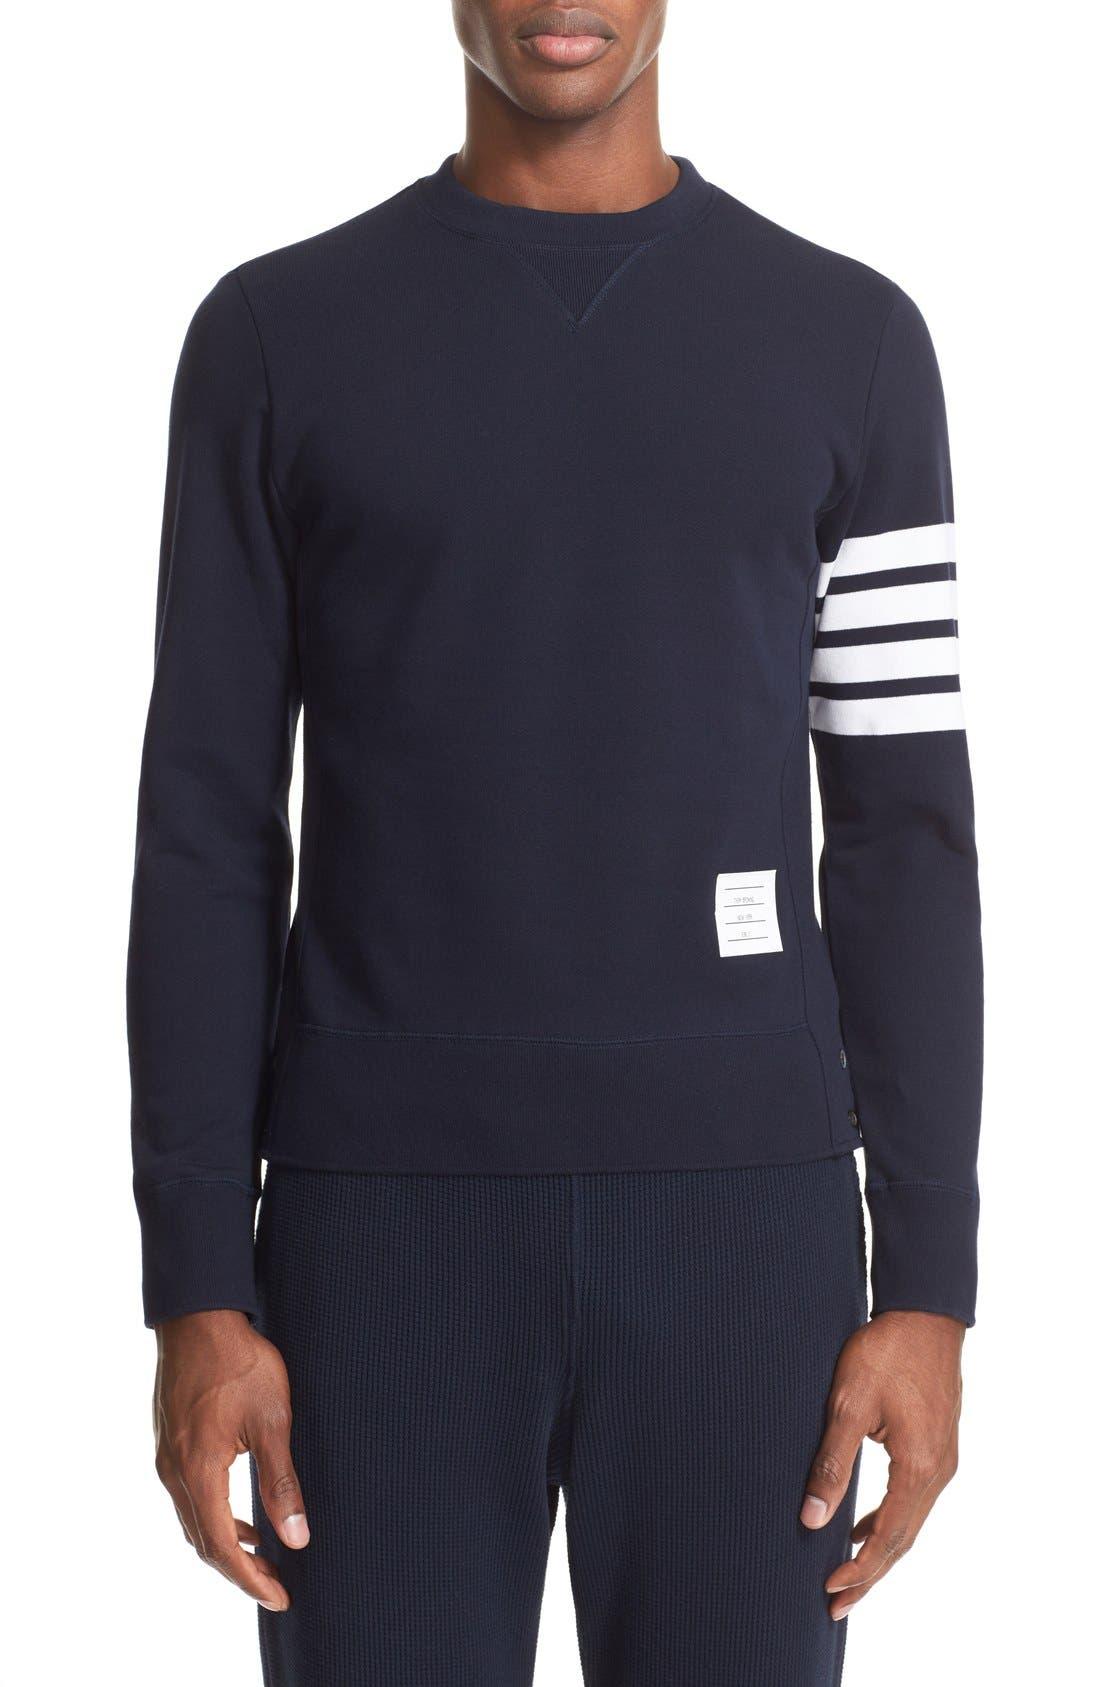 Stripe Sleeve Sweatshirt,                             Main thumbnail 1, color,                             Navy/ Optic White